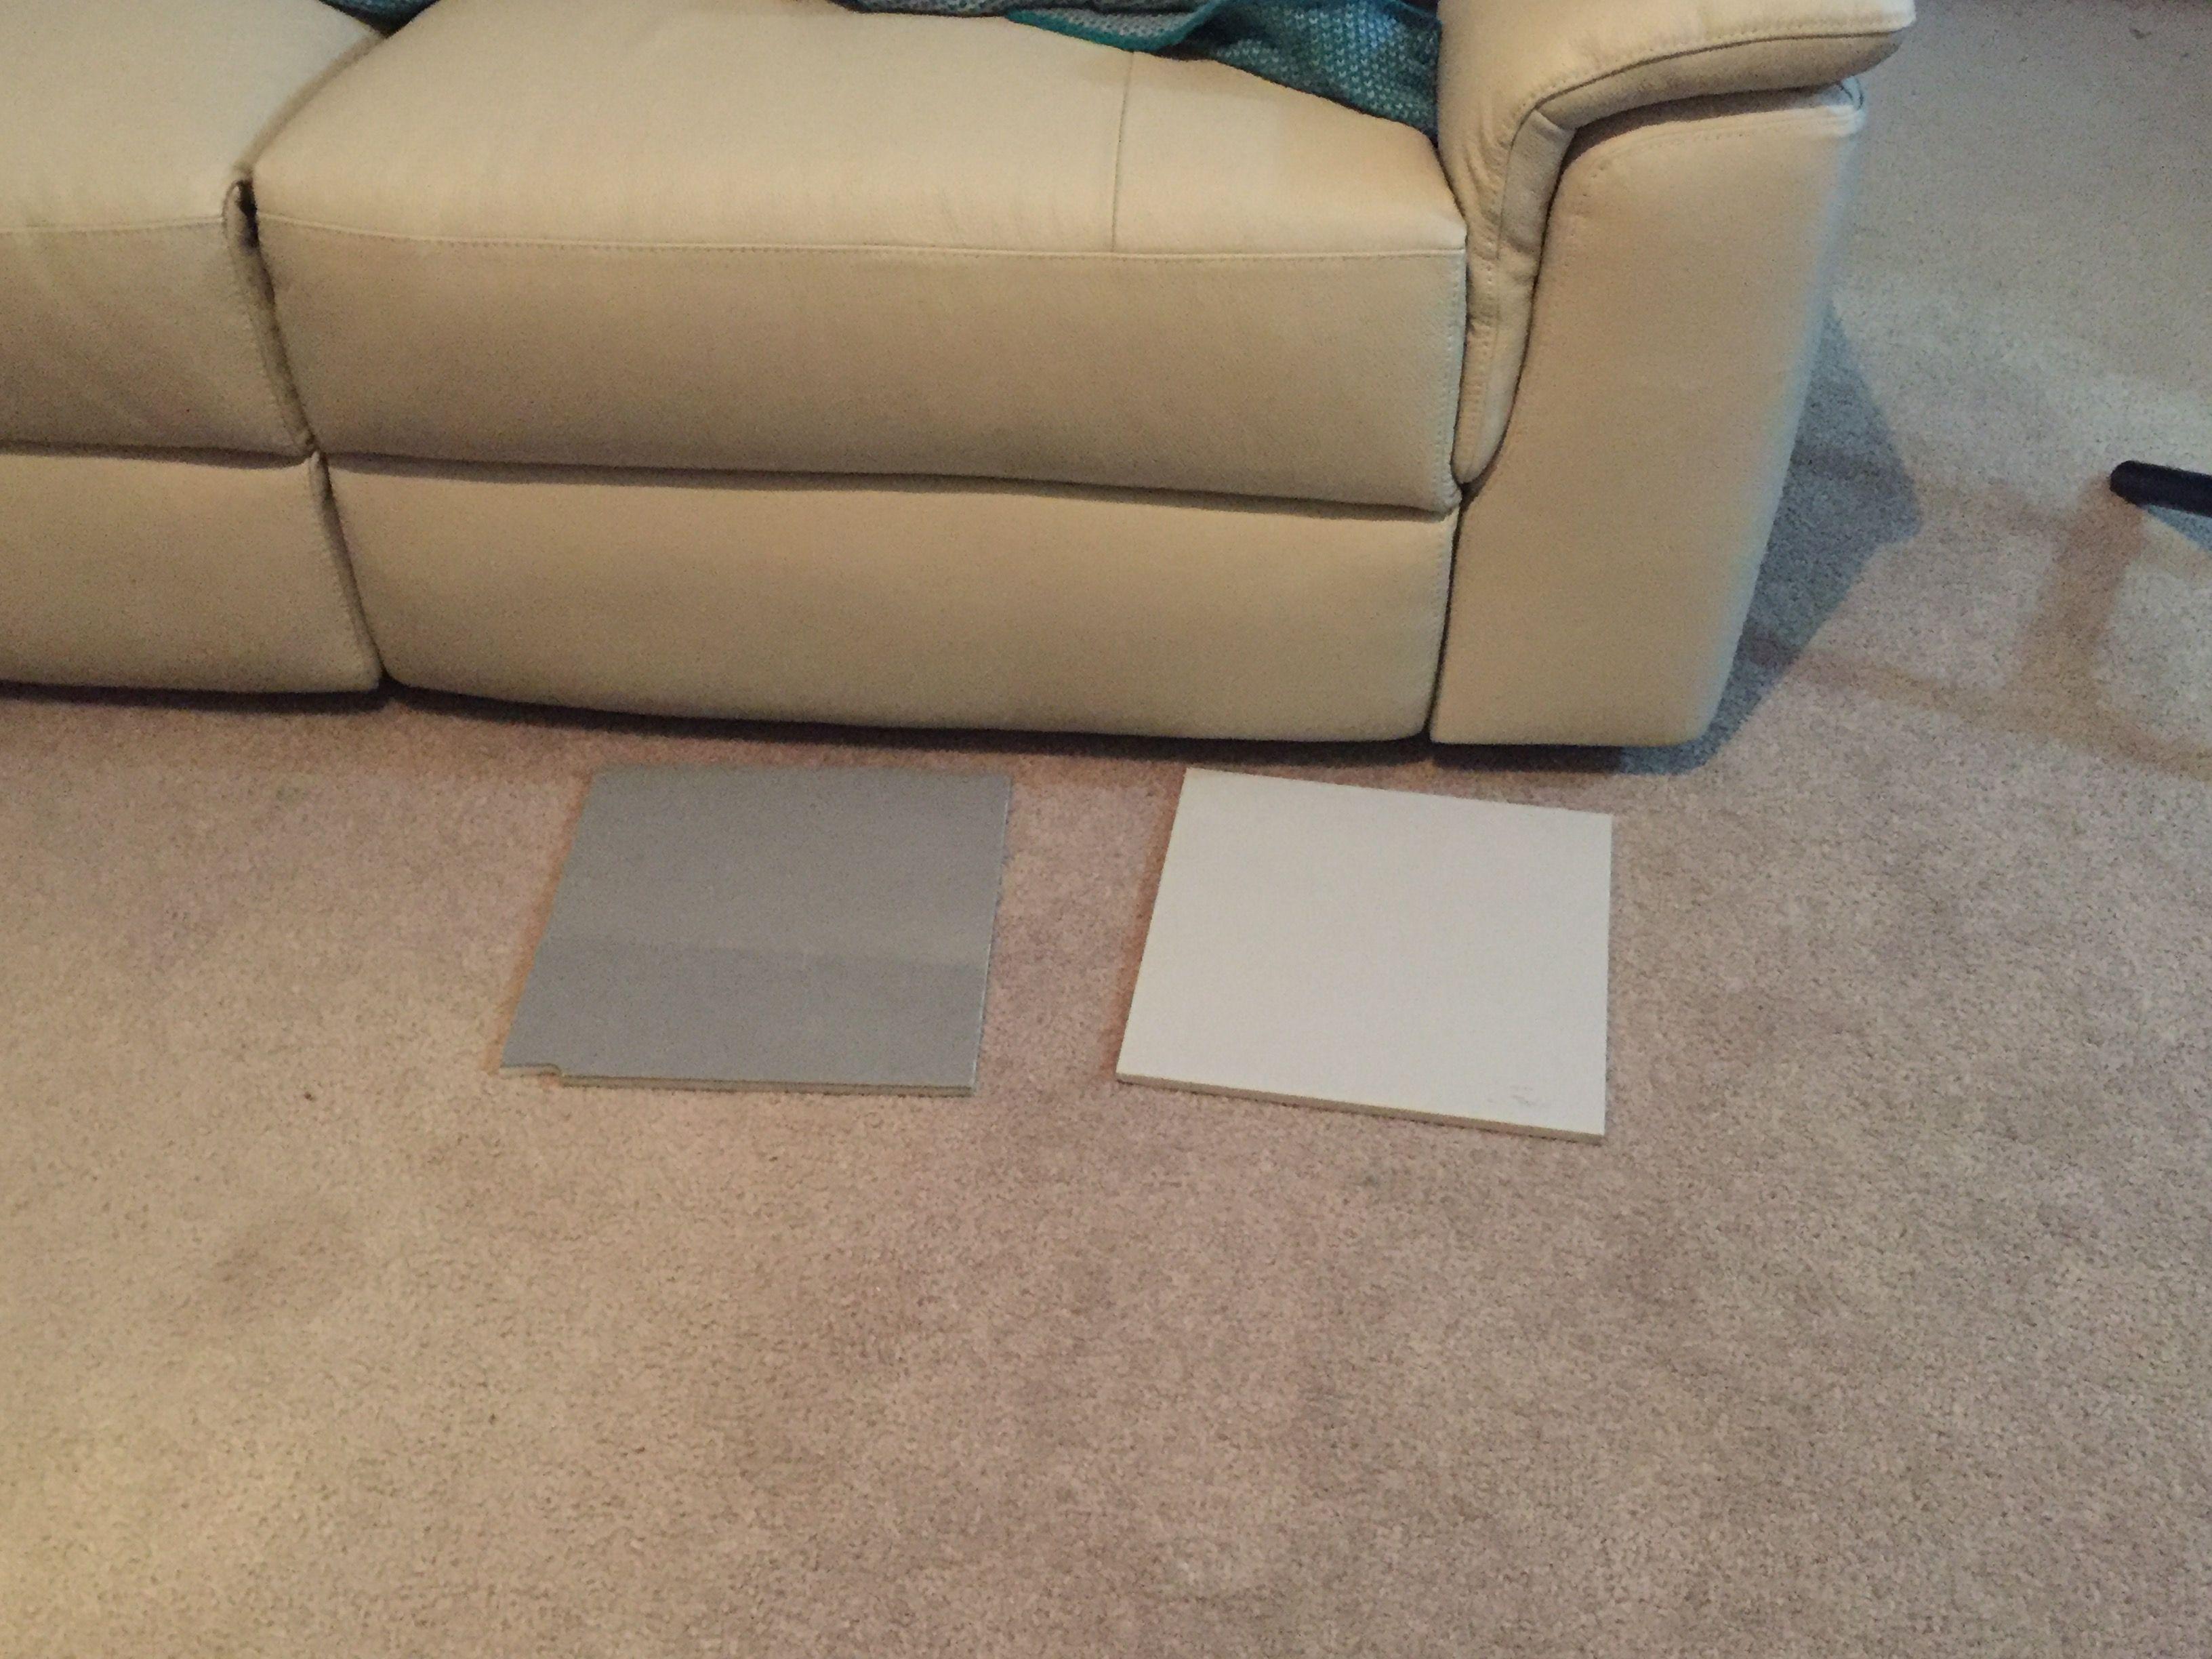 Idea by Gael Tomamichel on Bathroom ideas | Floor chair ...